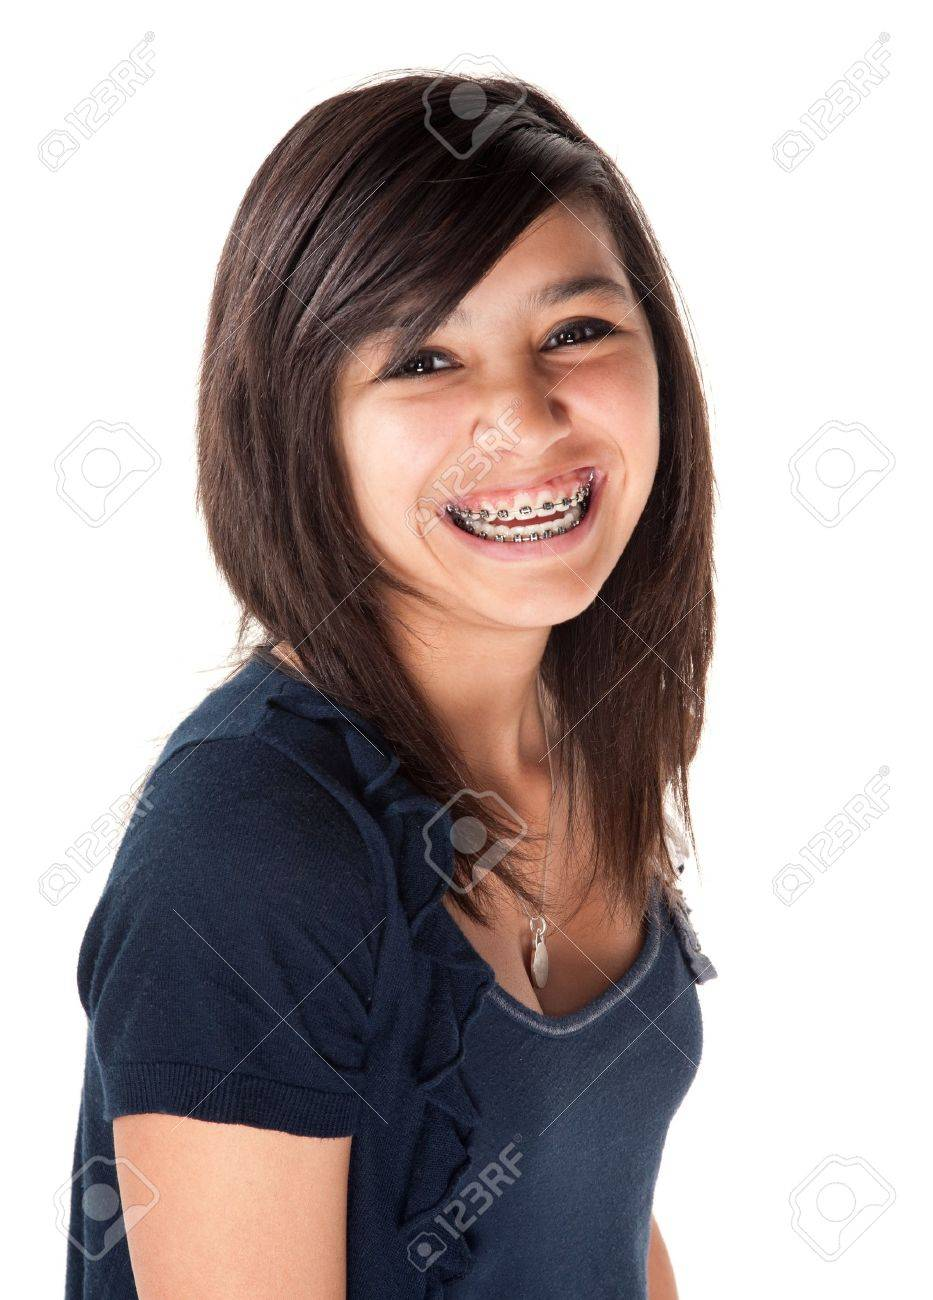 Girls with braces